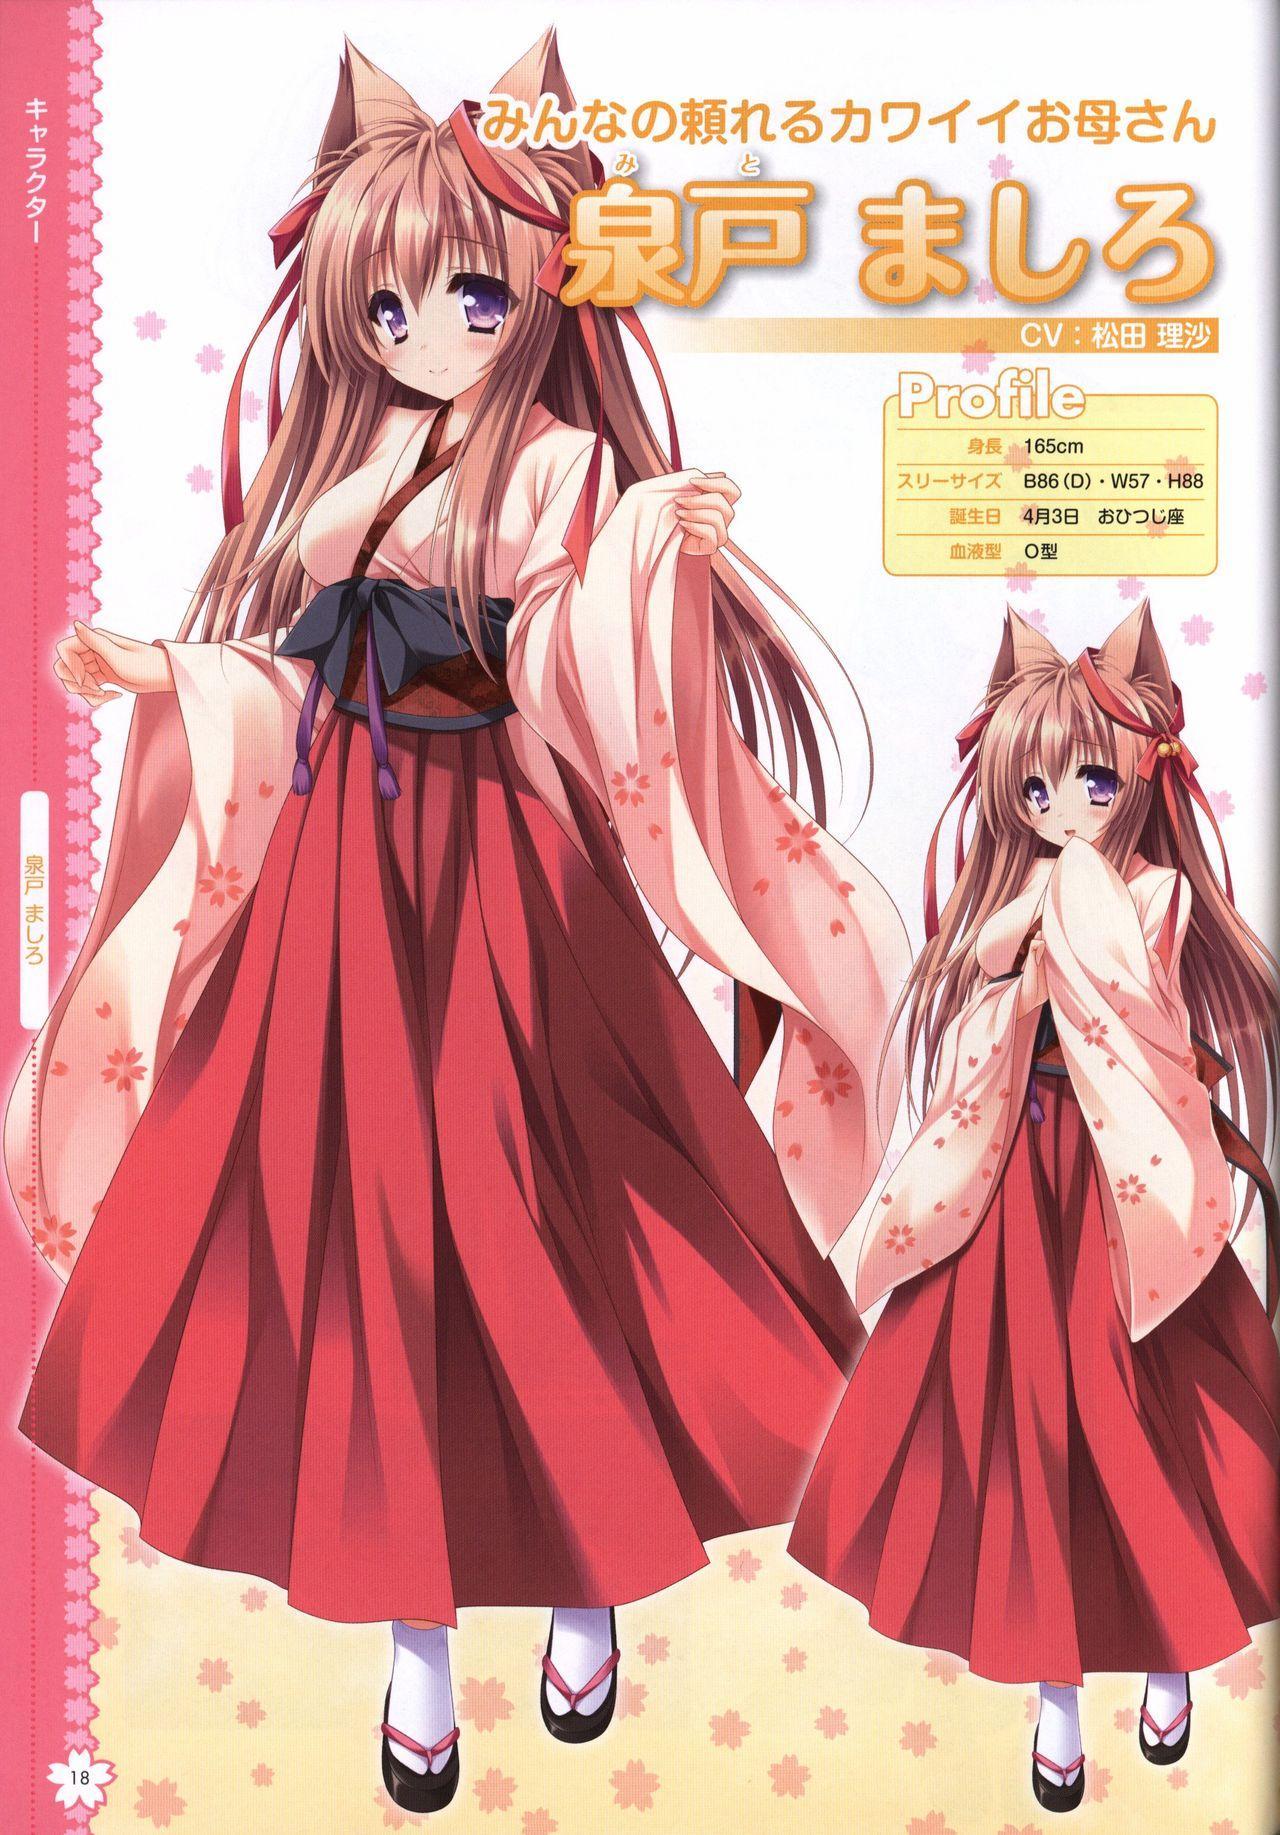 Tayutama2 Visual Art Fanbook 20